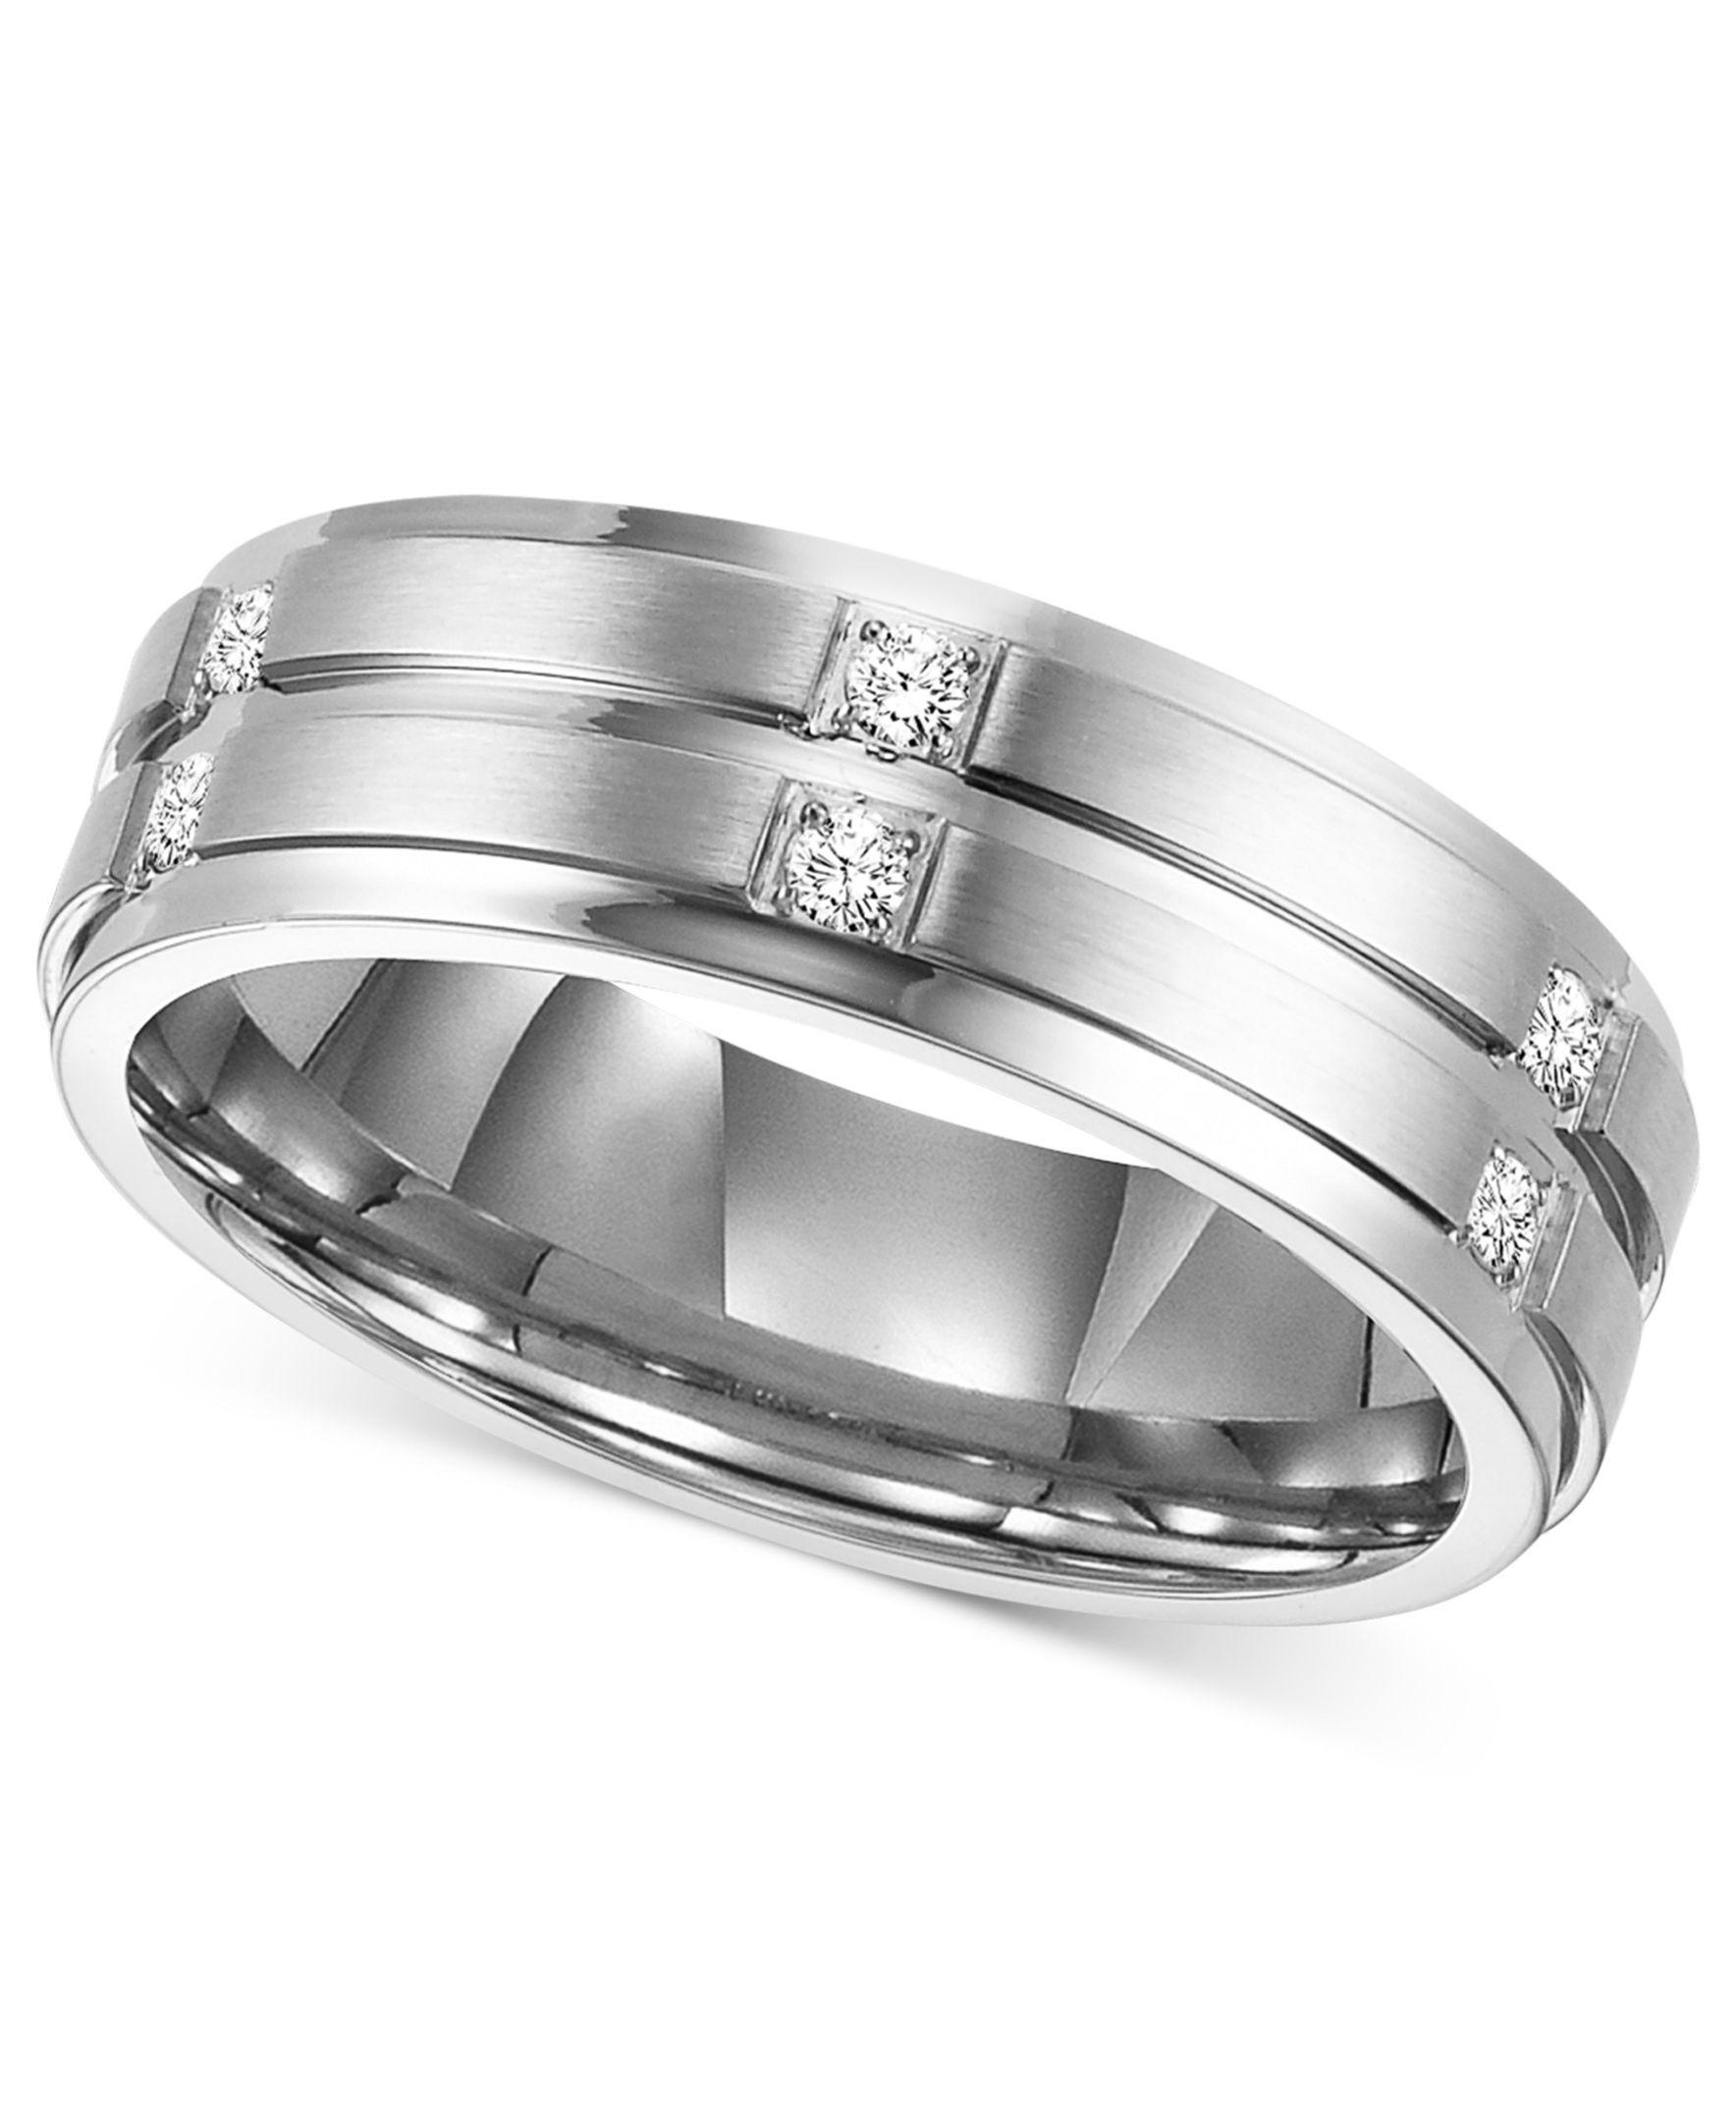 Men's Diamond Wedding Band Ring in Stainless Steel (1/6 ct